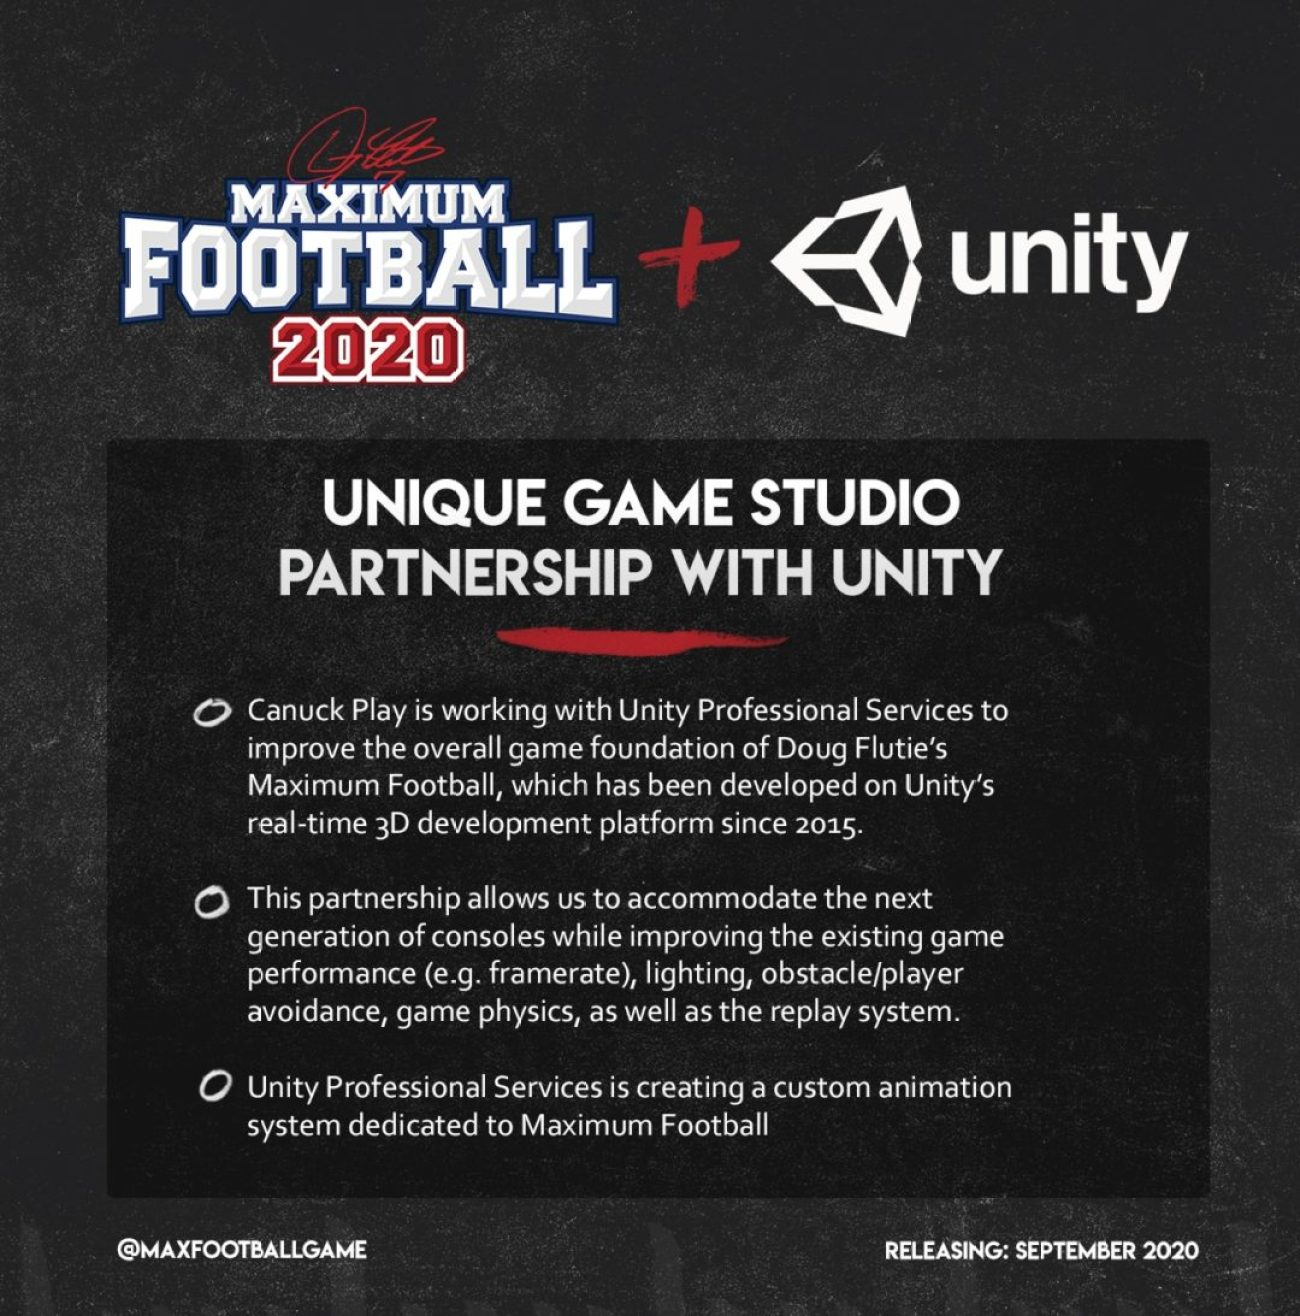 Doug Flutie's Maximum Football 2020 Unity Partnership